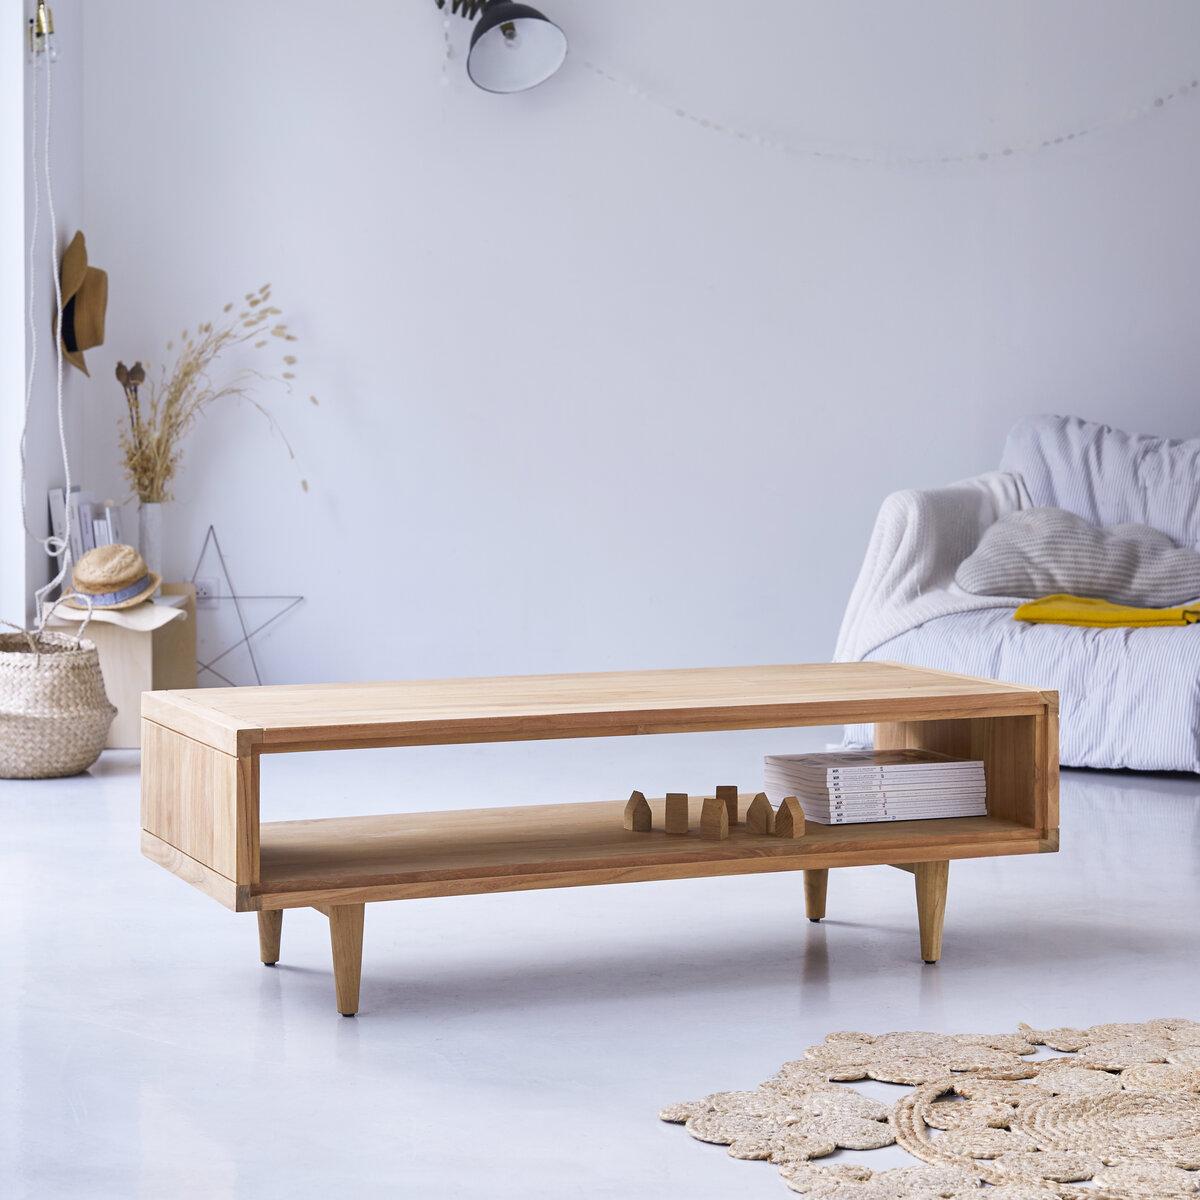 Table basse en teck massif 120x50